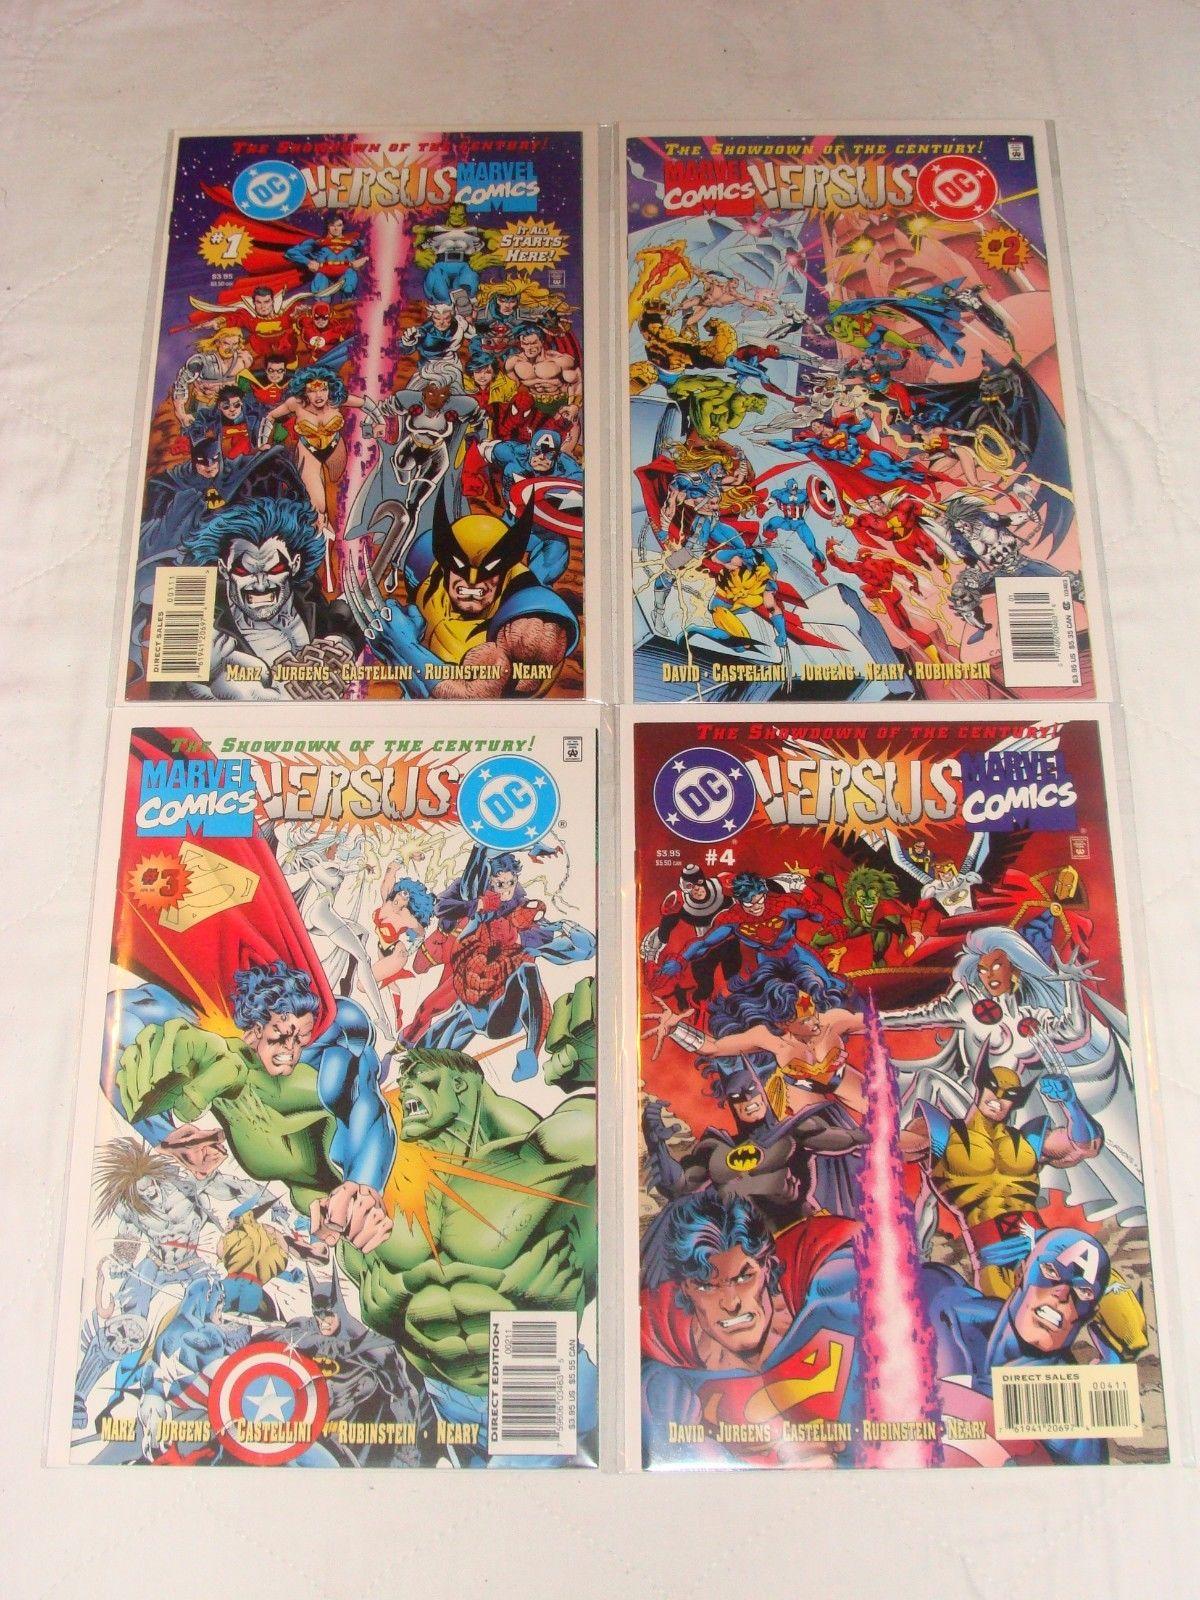 DC Versus Marvel / Marvel Versus DC #1-4 1 2 3 4 Complete Run (Feb 1996, DC)